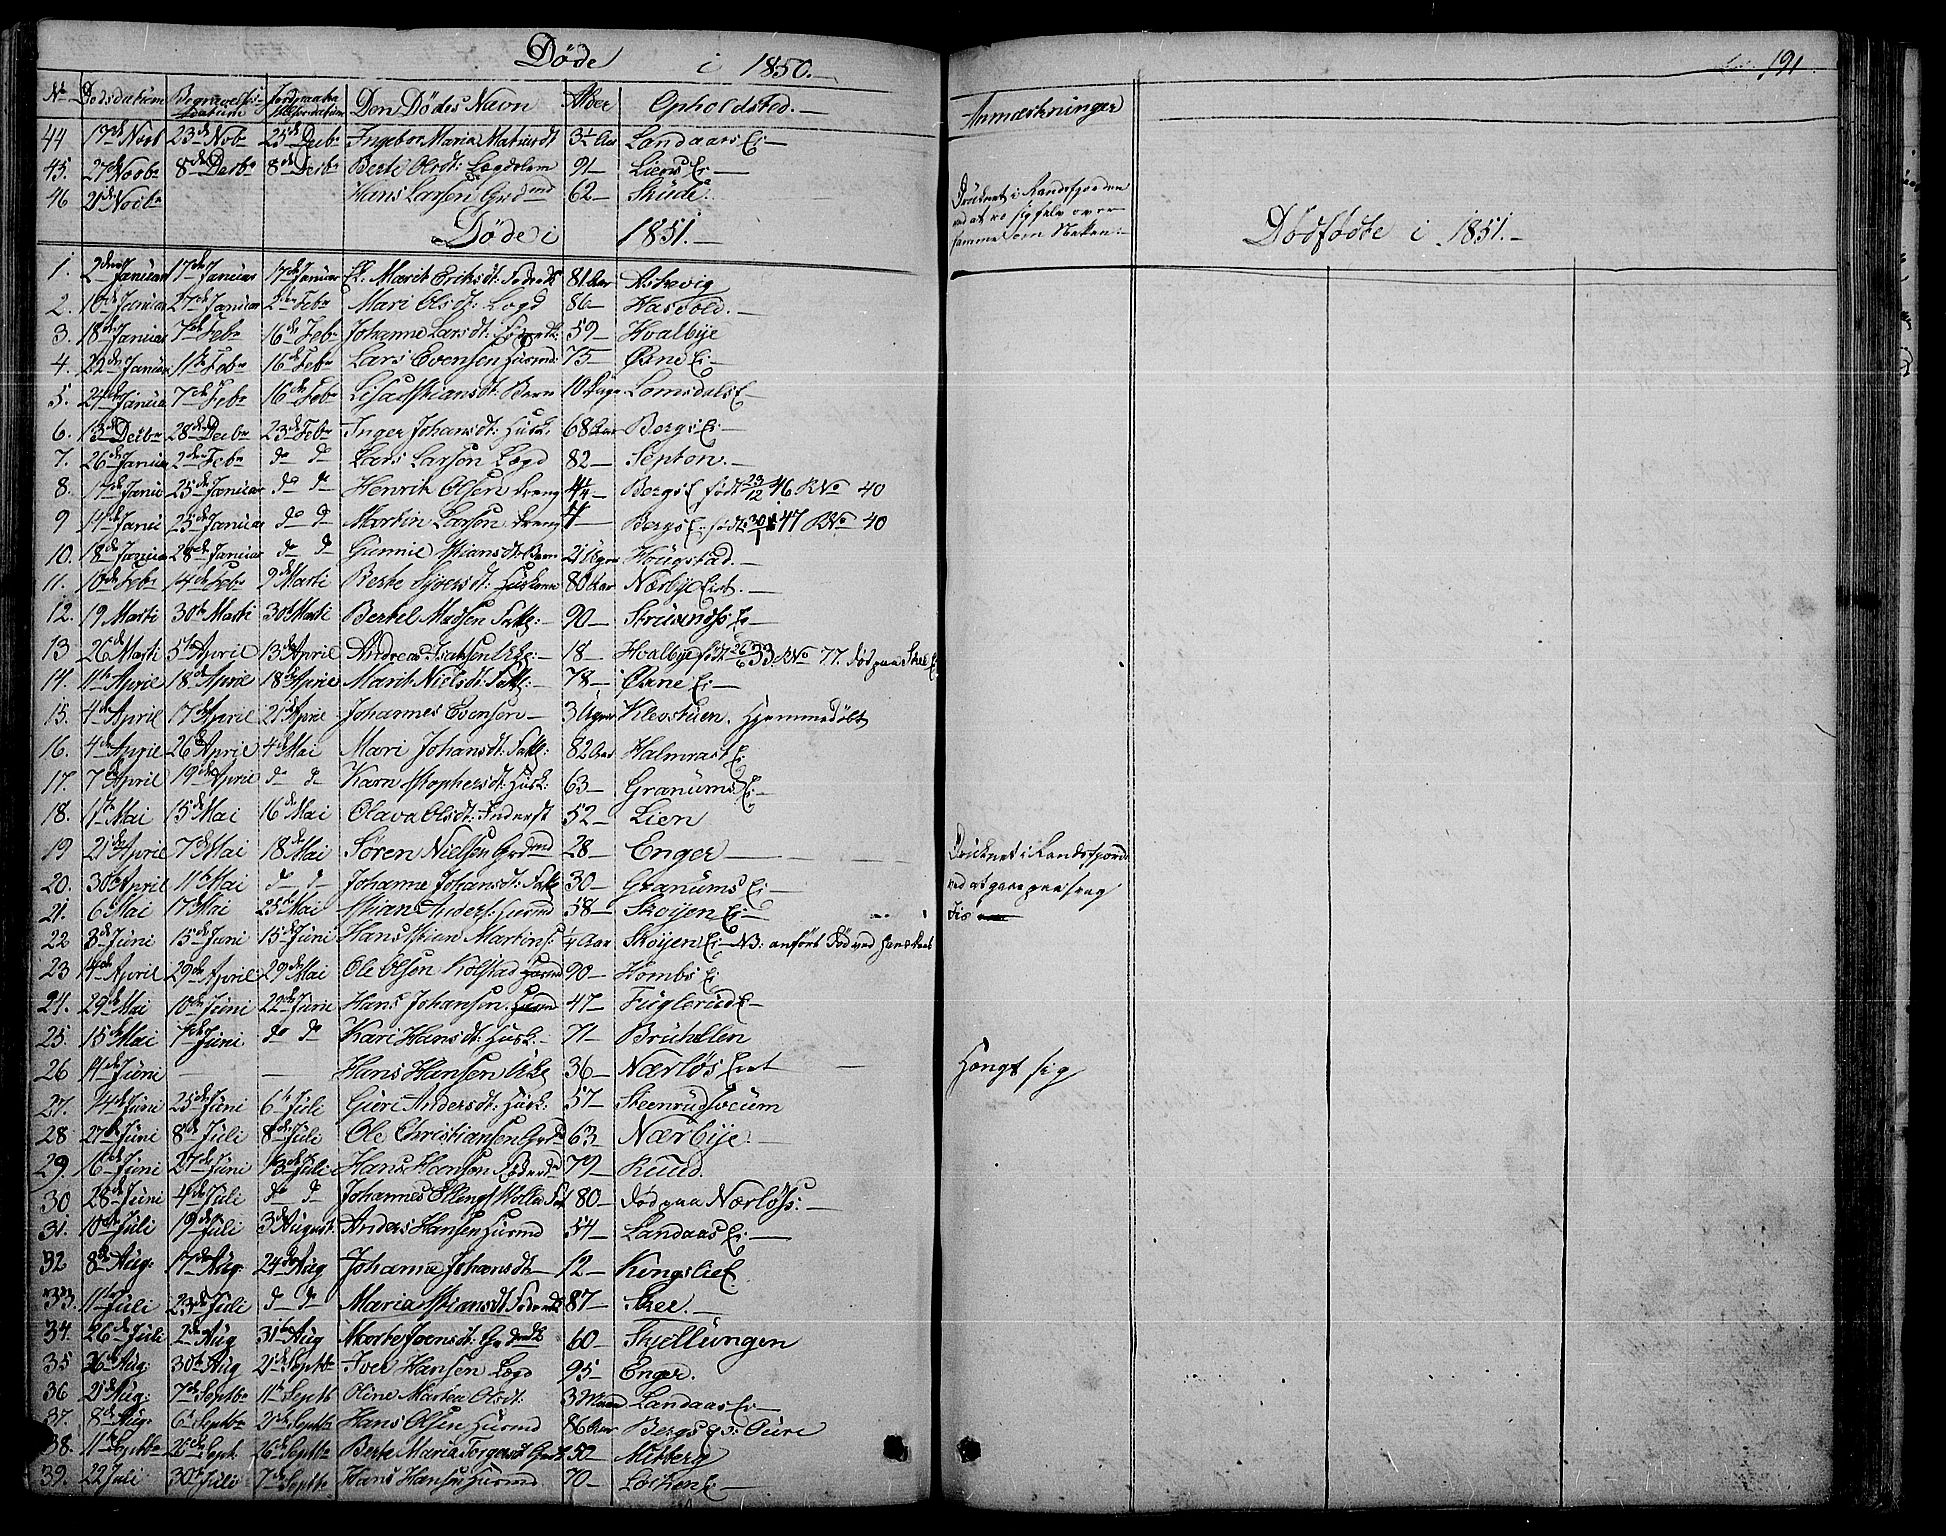 SAH, Søndre Land prestekontor, L/L0001: Klokkerbok nr. 1, 1849-1883, s. 191